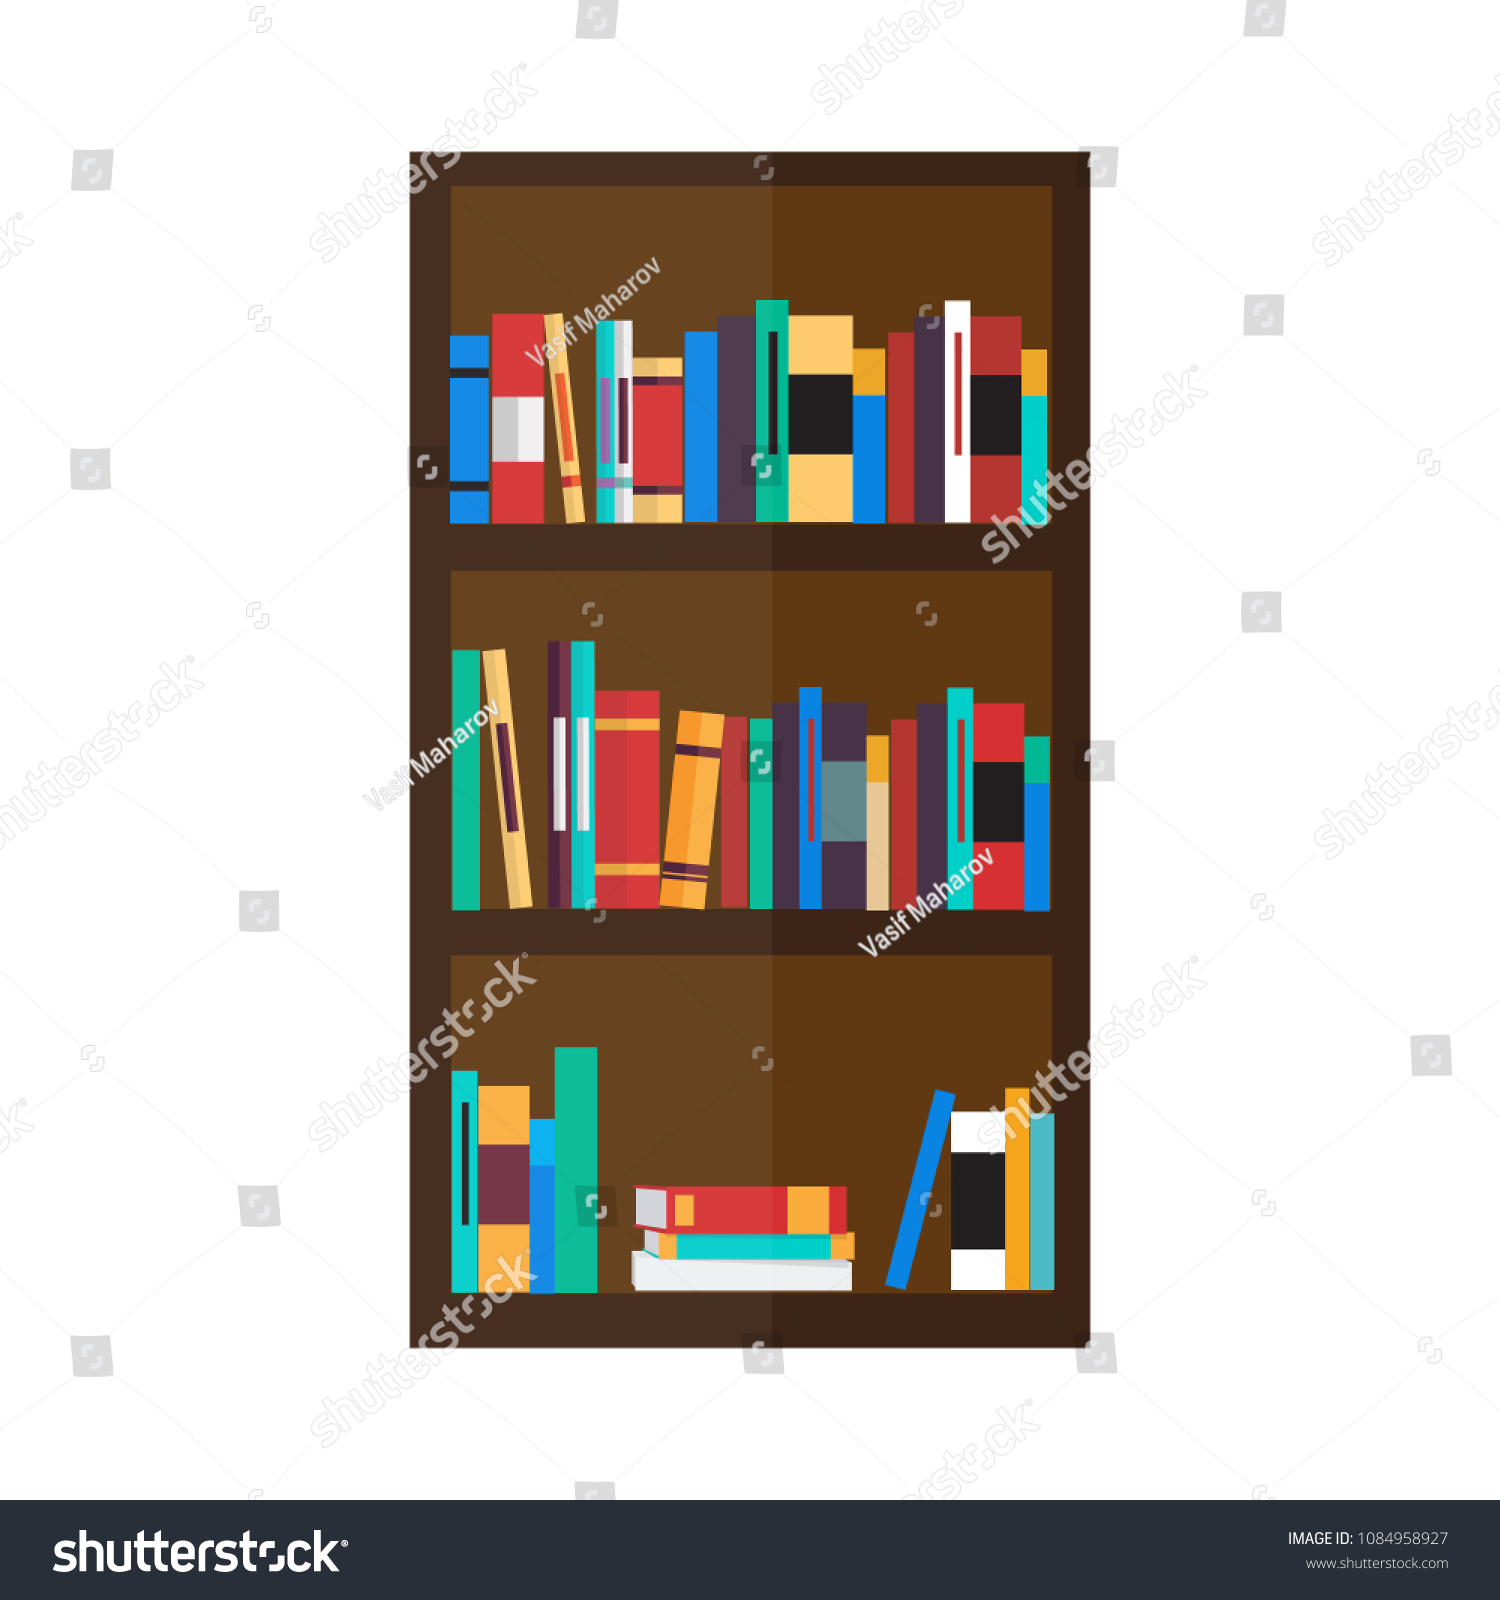 Bookshelf Icon In Flat Style Isolated Vector Illustration On White Transparent Background